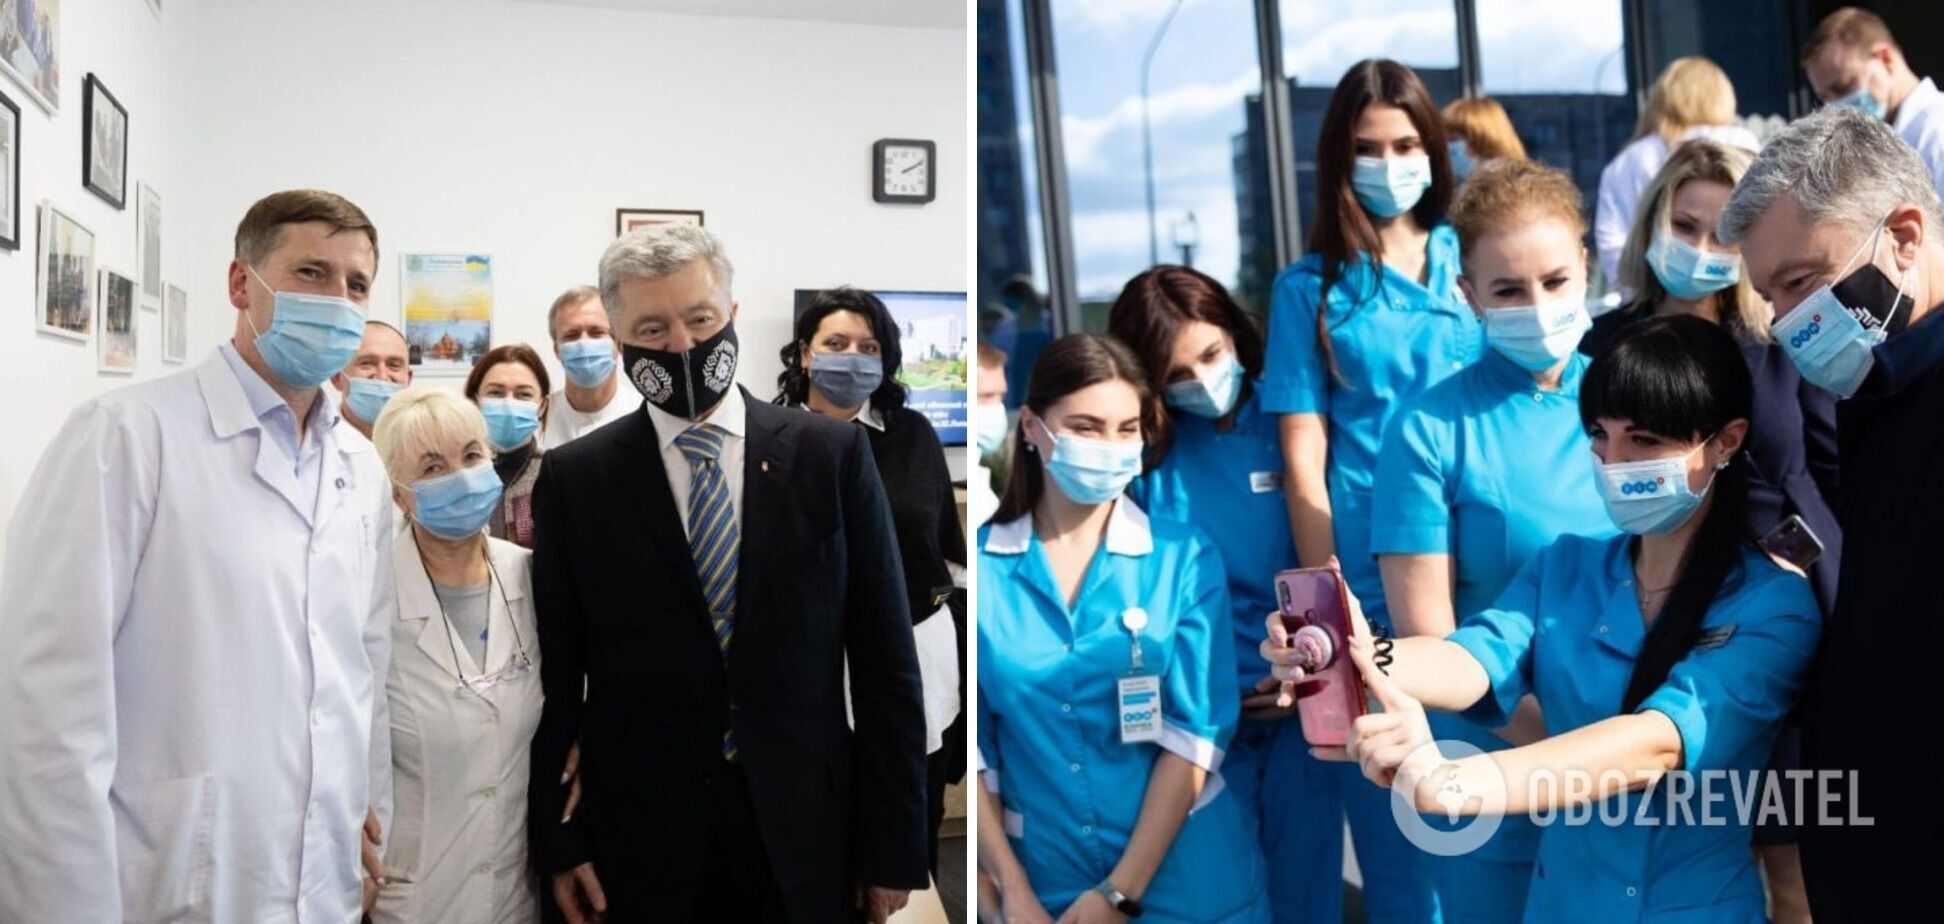 Порошенко – українським медикам: ви проявили себе як справжні герої